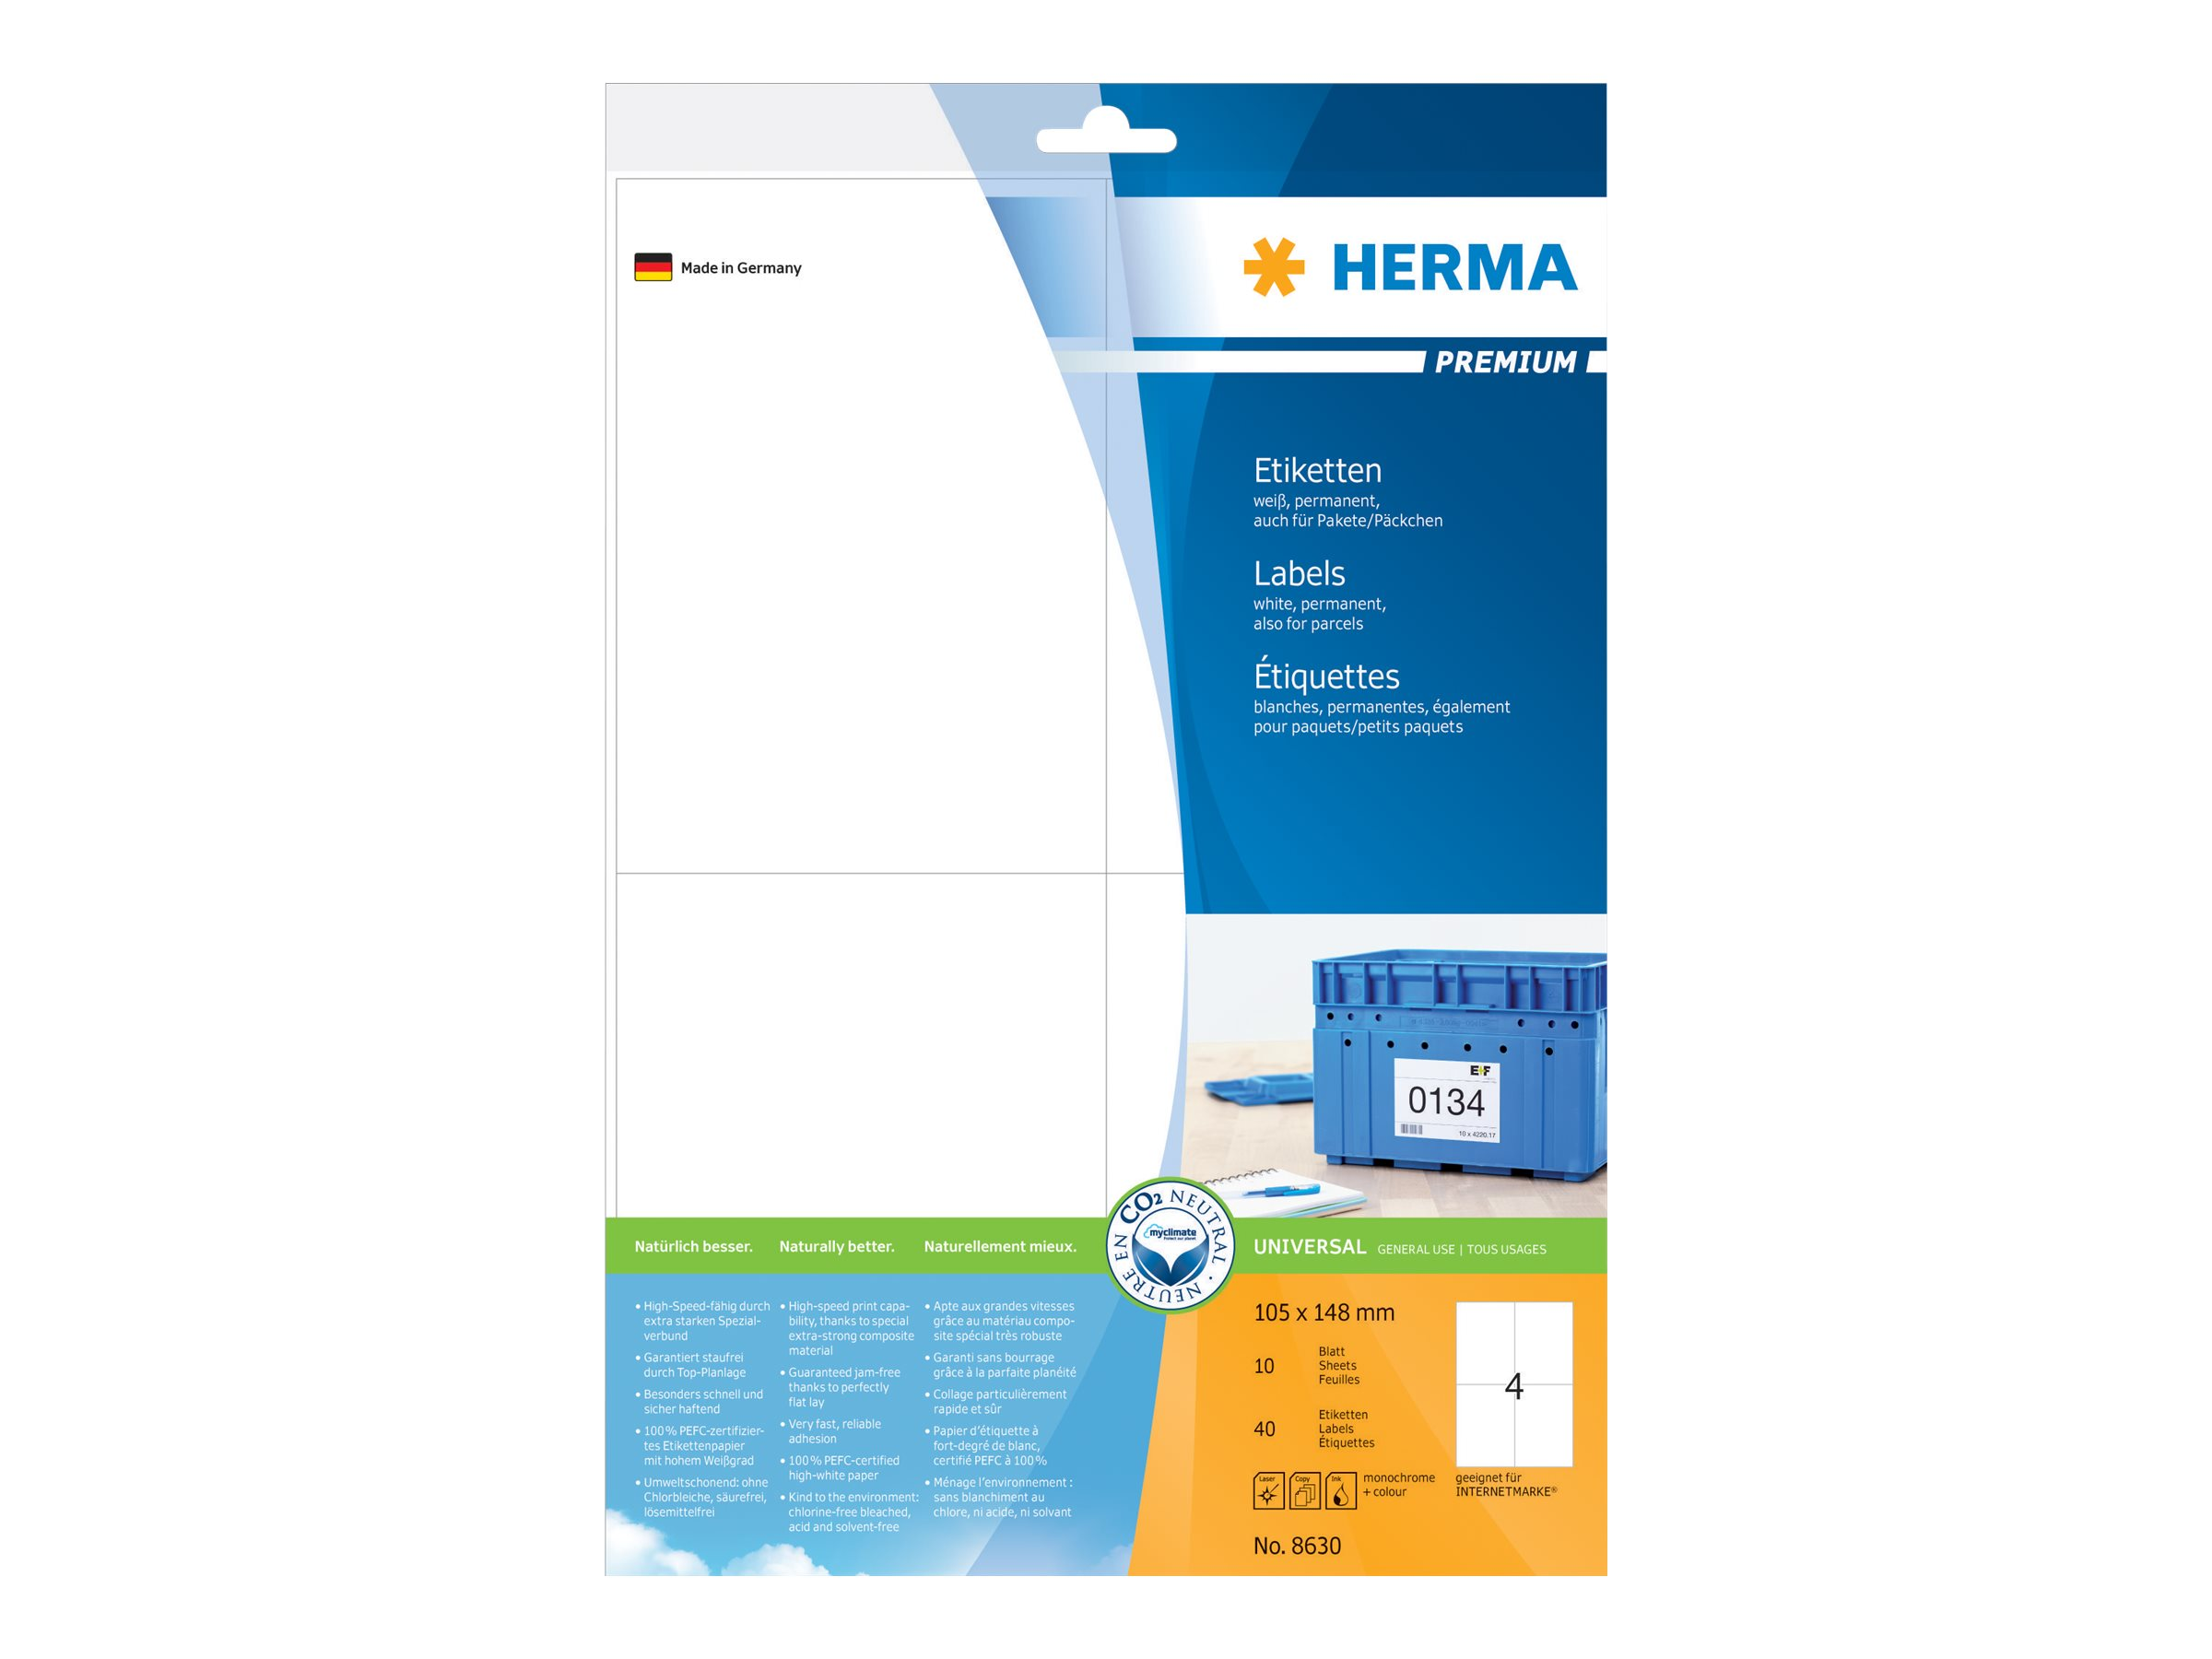 HERMA Premium - Papier - matt - permanent selbstklebend - weiß - A6 (105 x 148 mm)